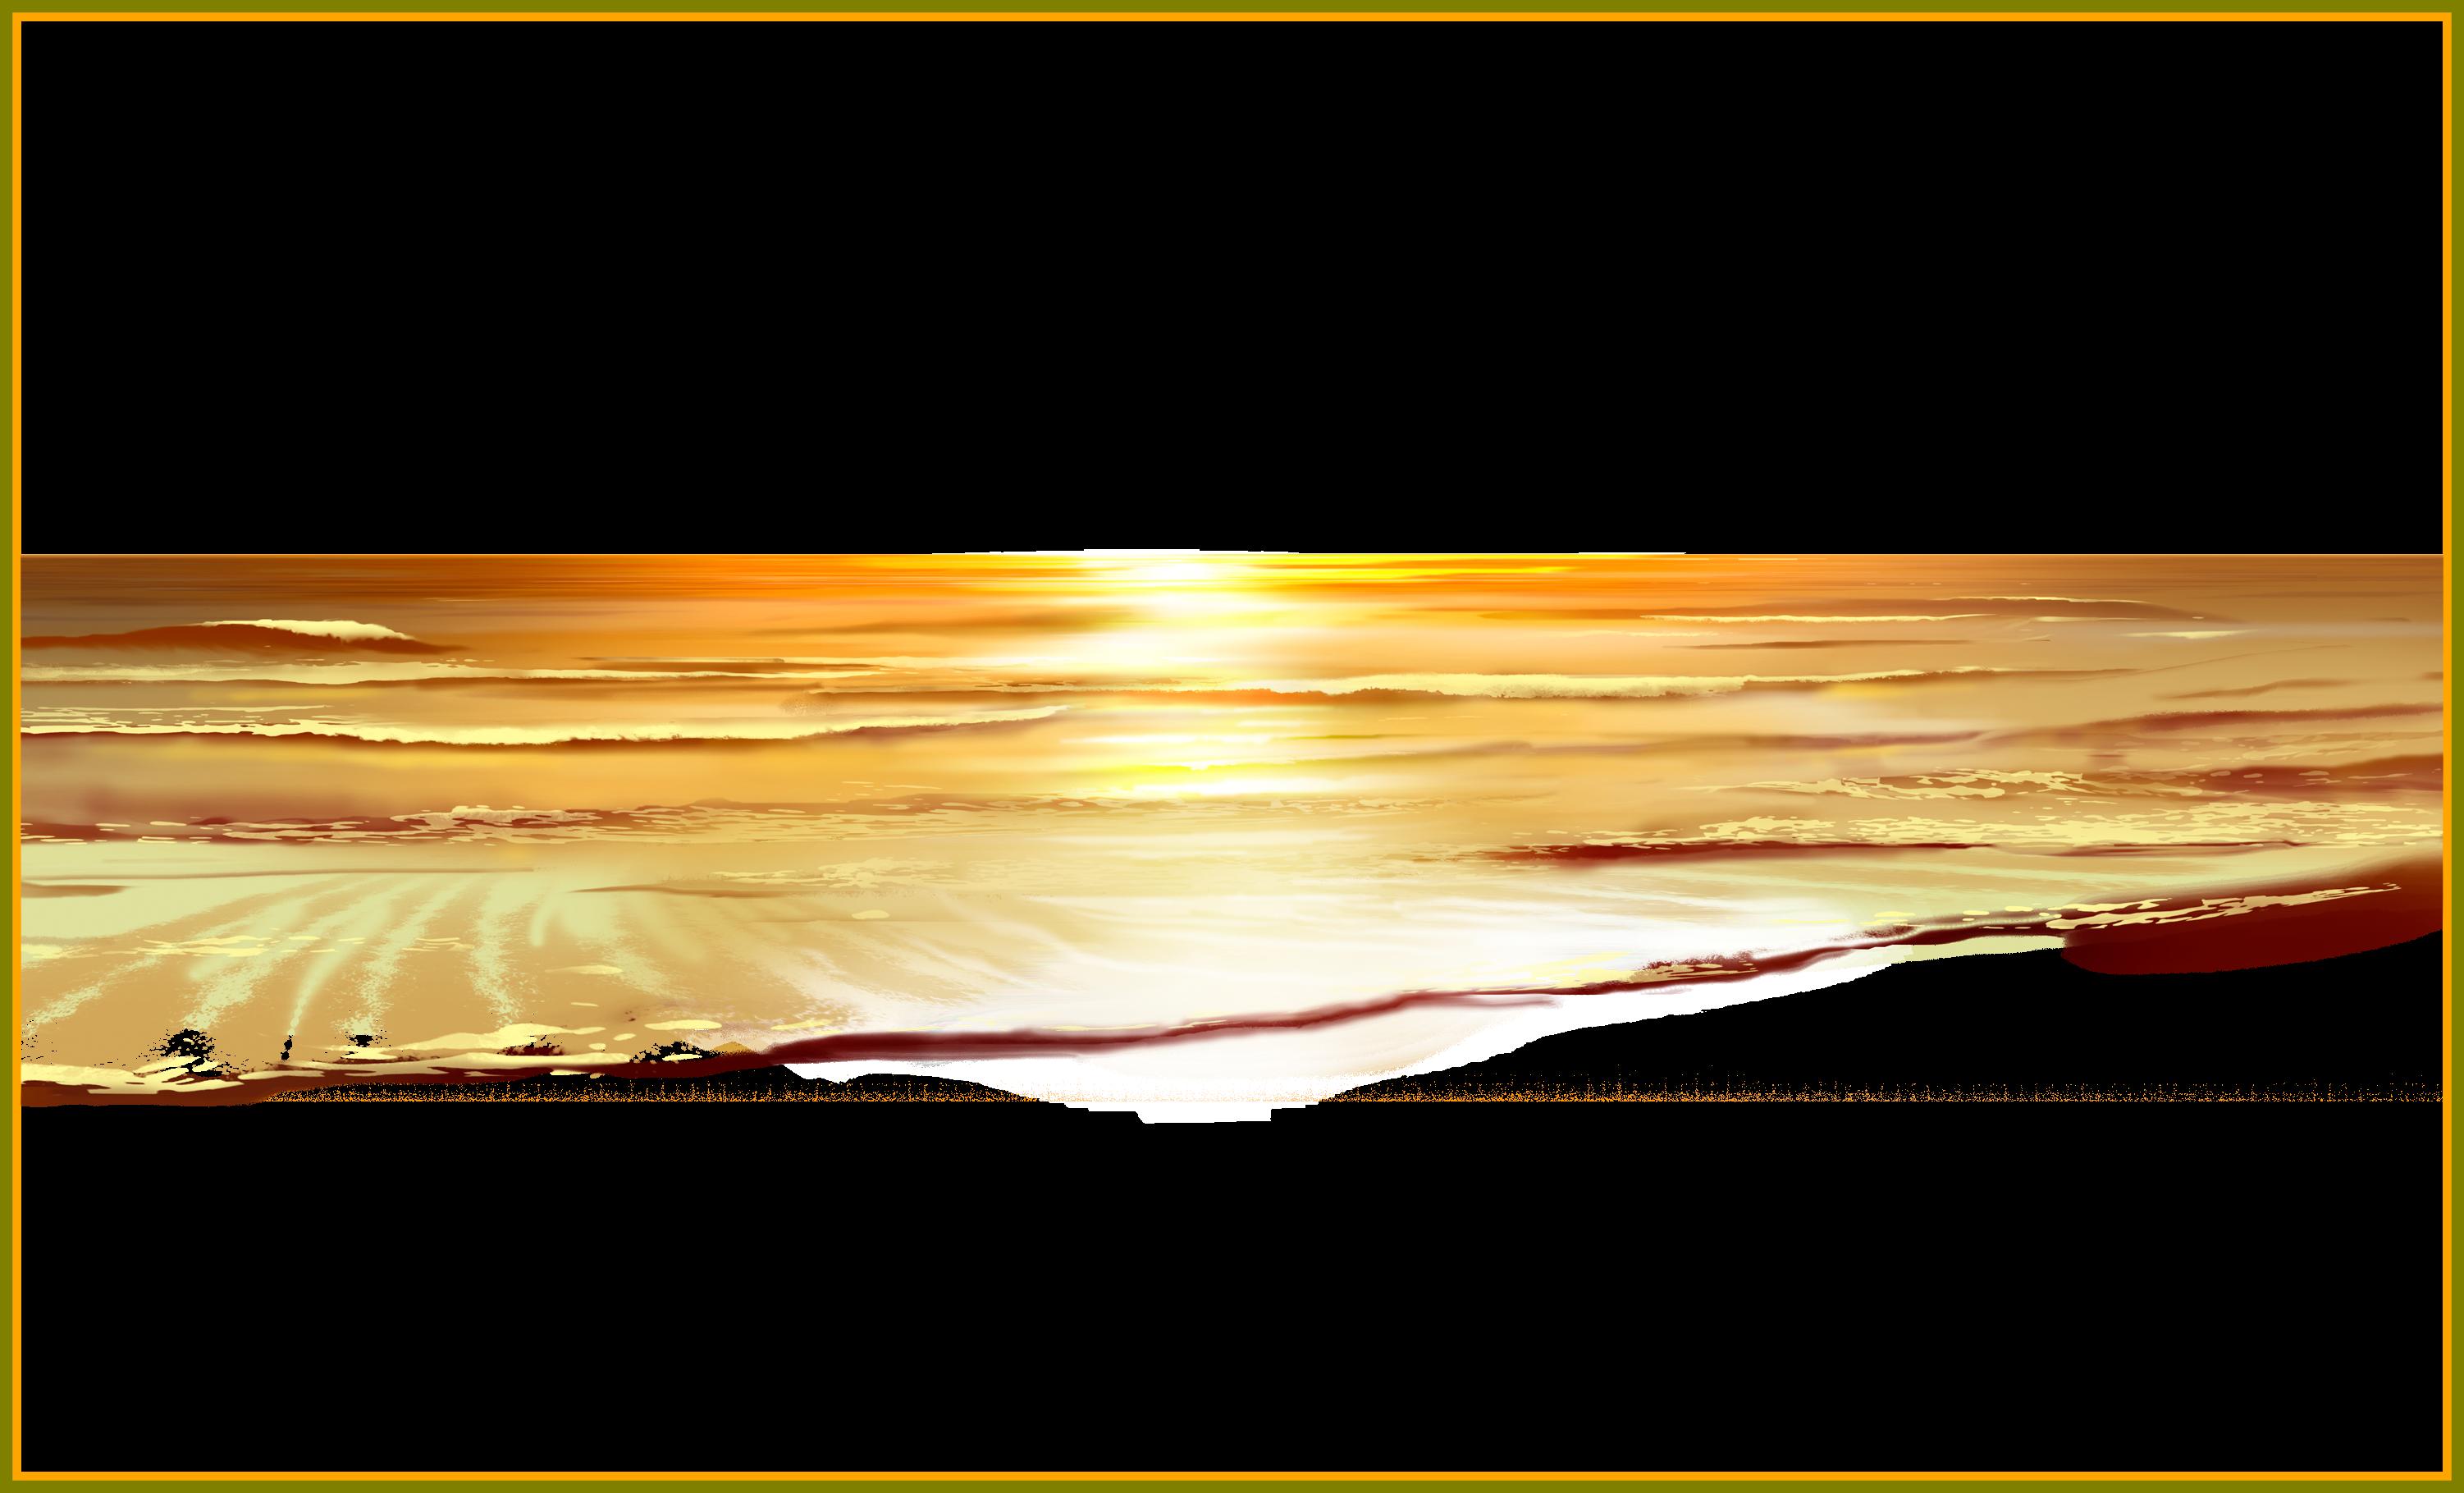 sunset clipart sunset background